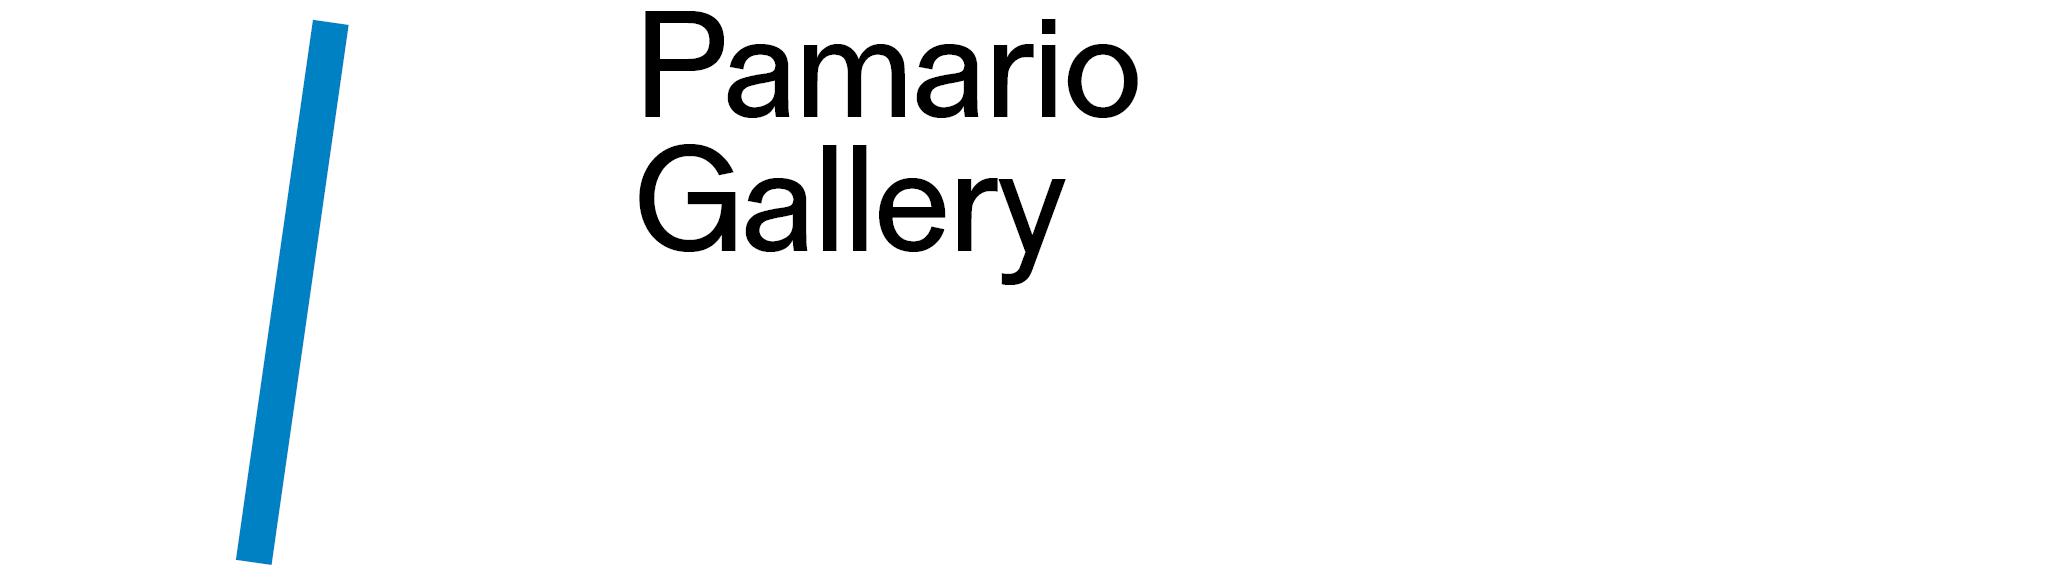 Pamario Gallery